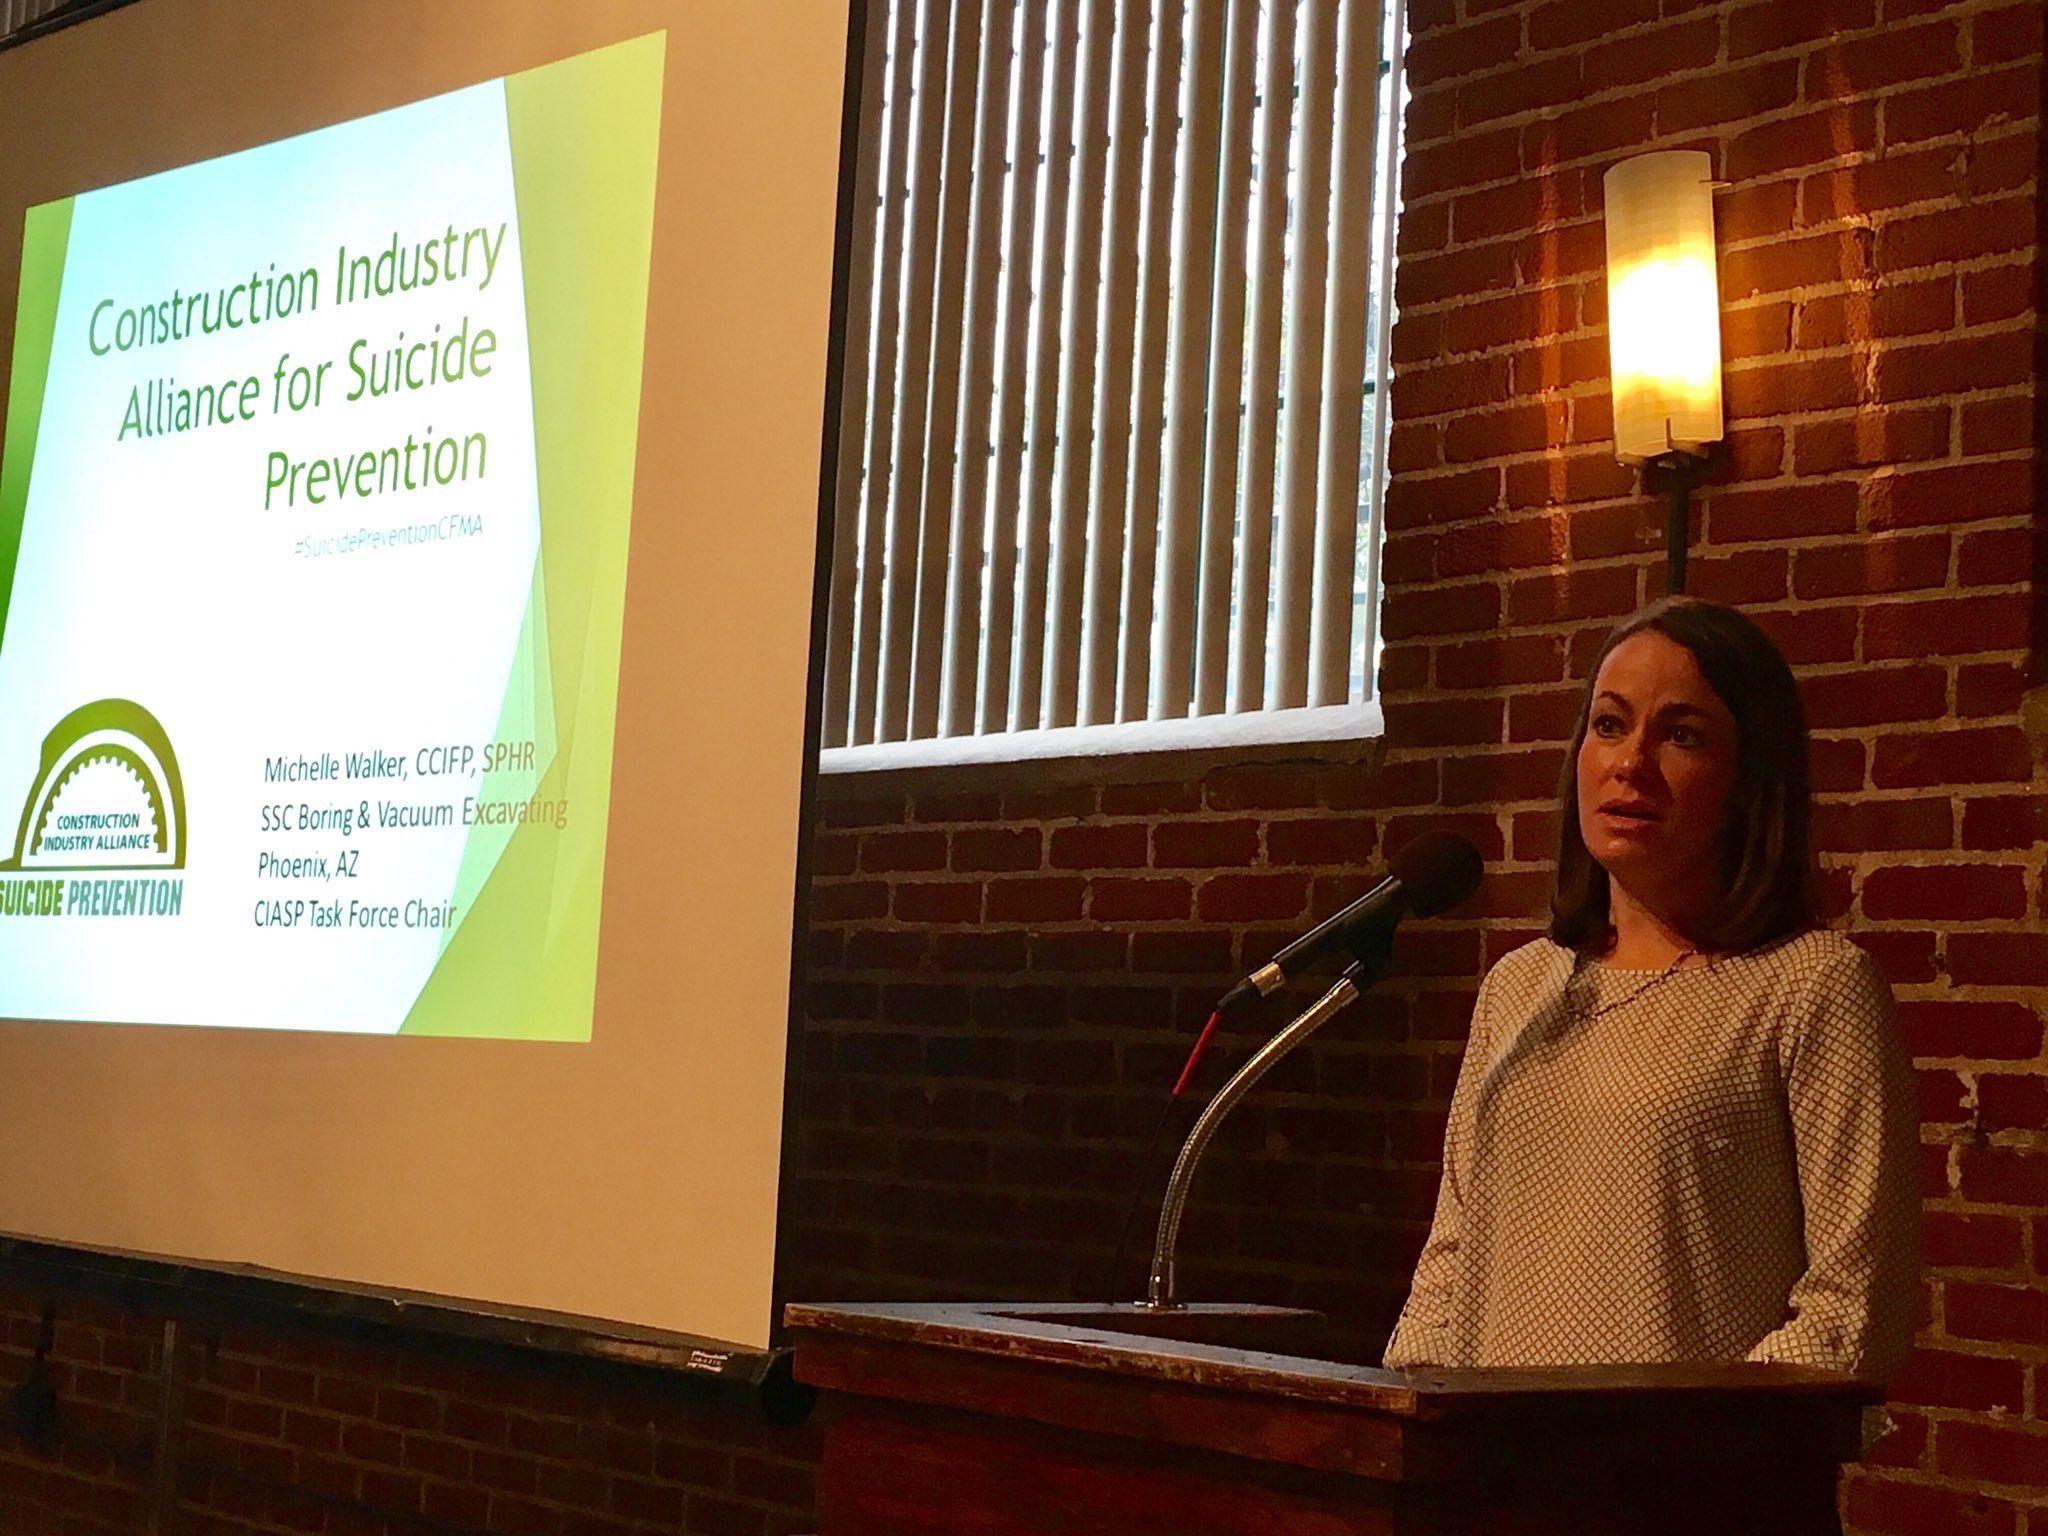 Michelle Walker giving presentation